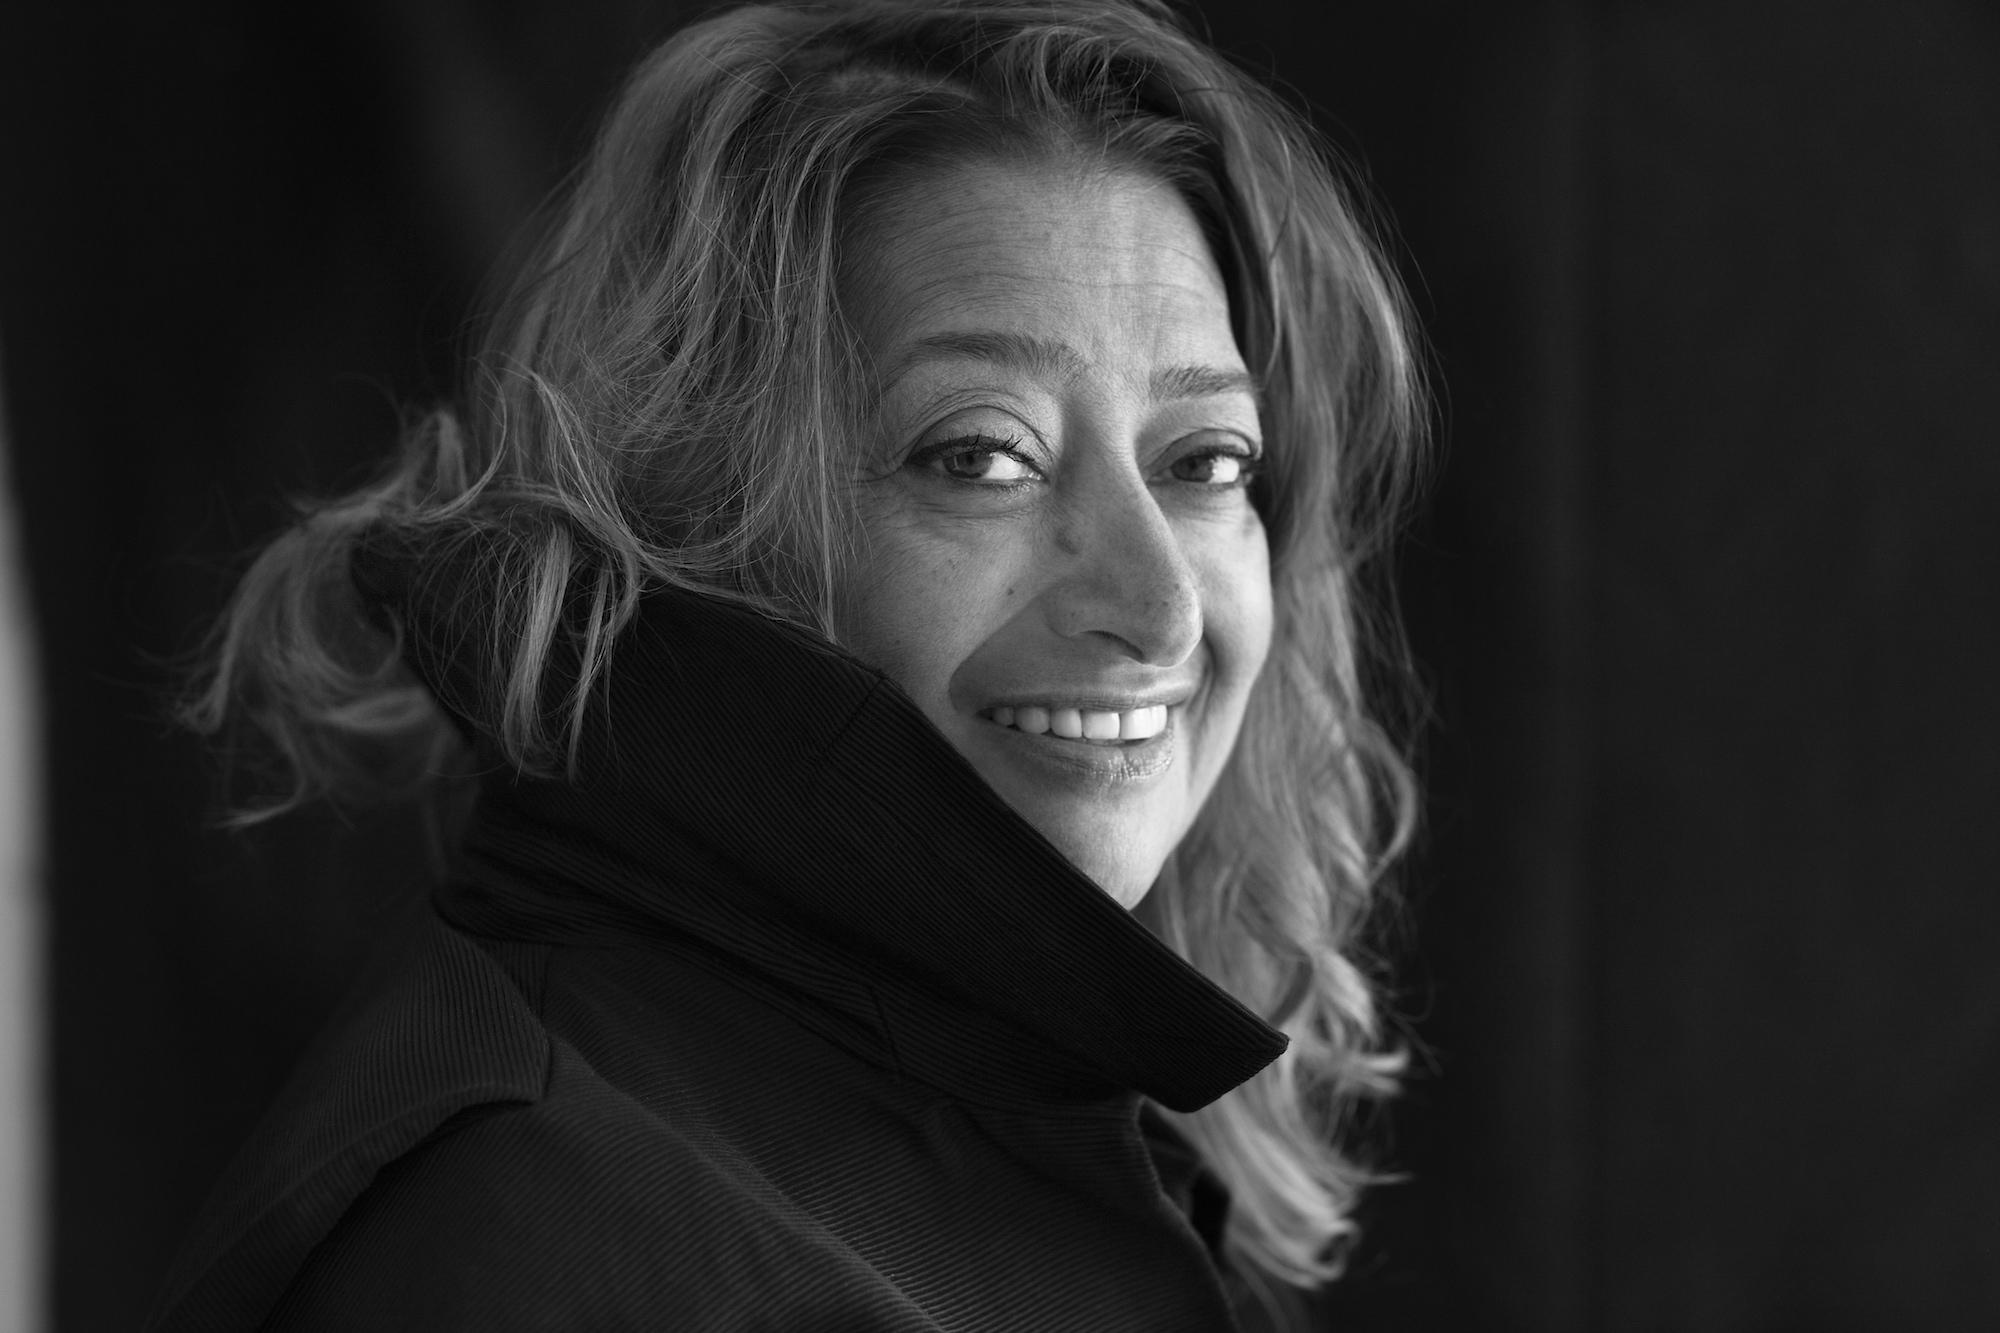 Zaha Hadid by Brigette Lacombe